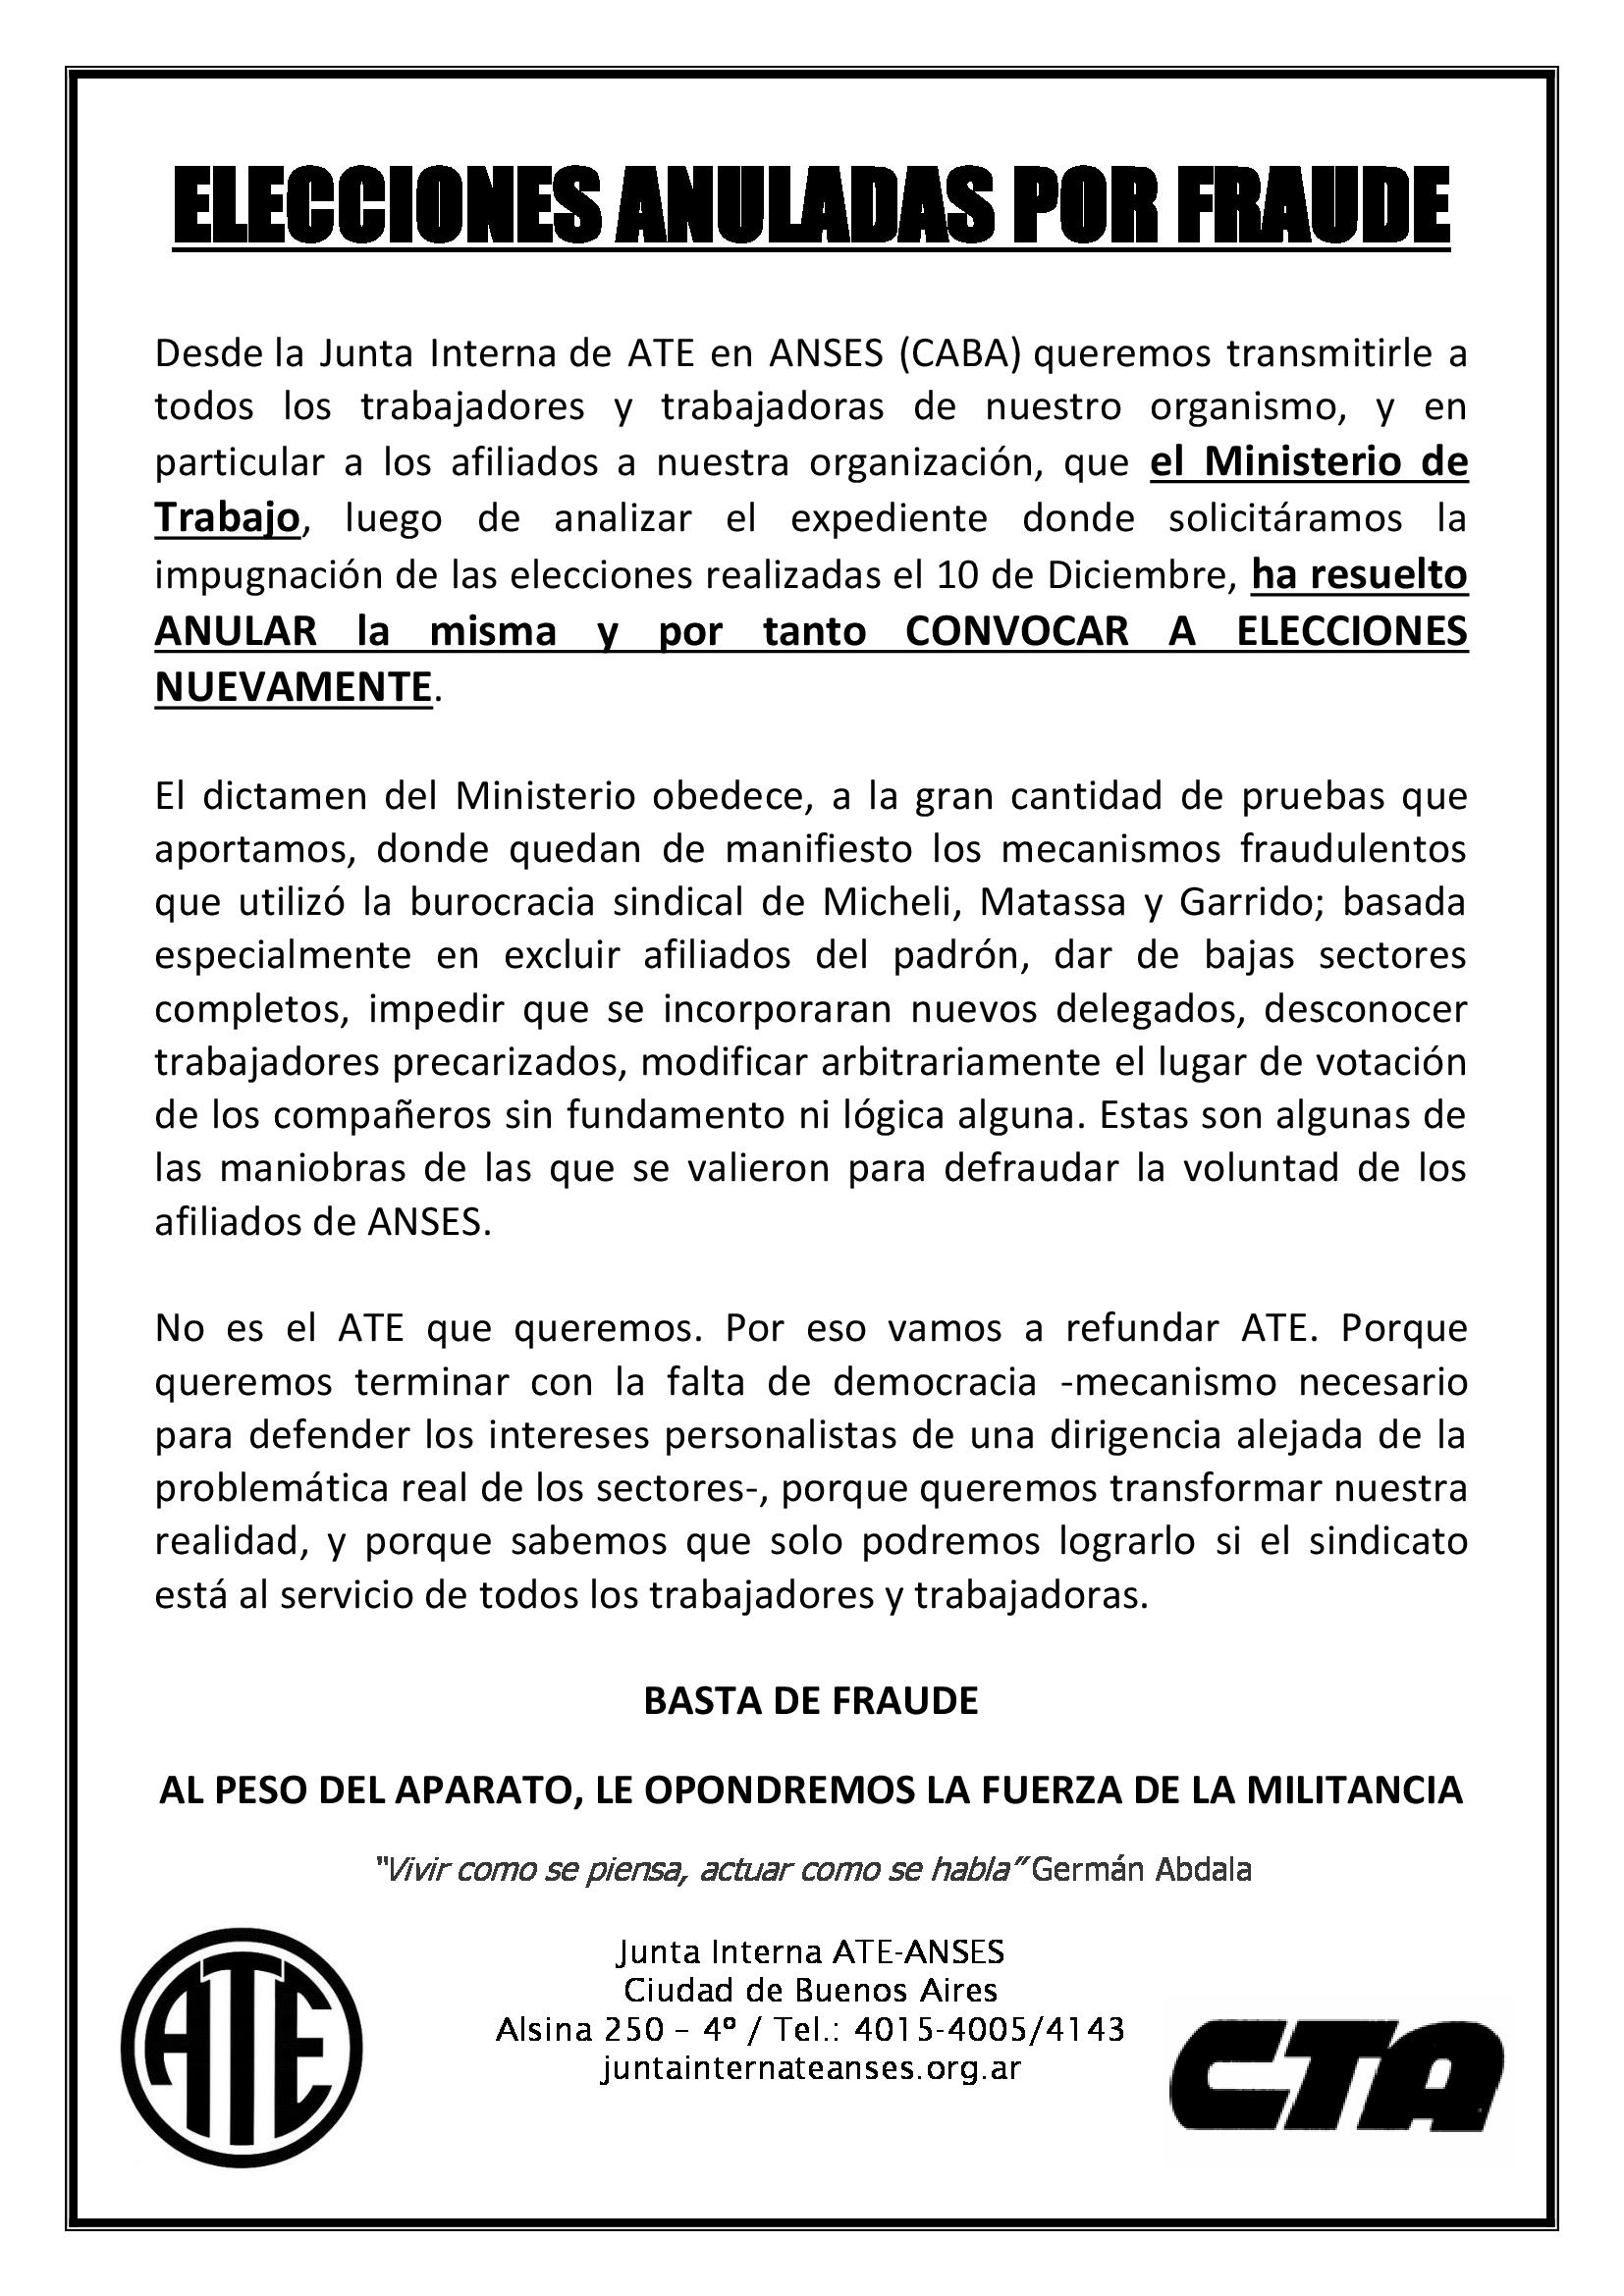 Elecciones_Anuladas_por_Fraude